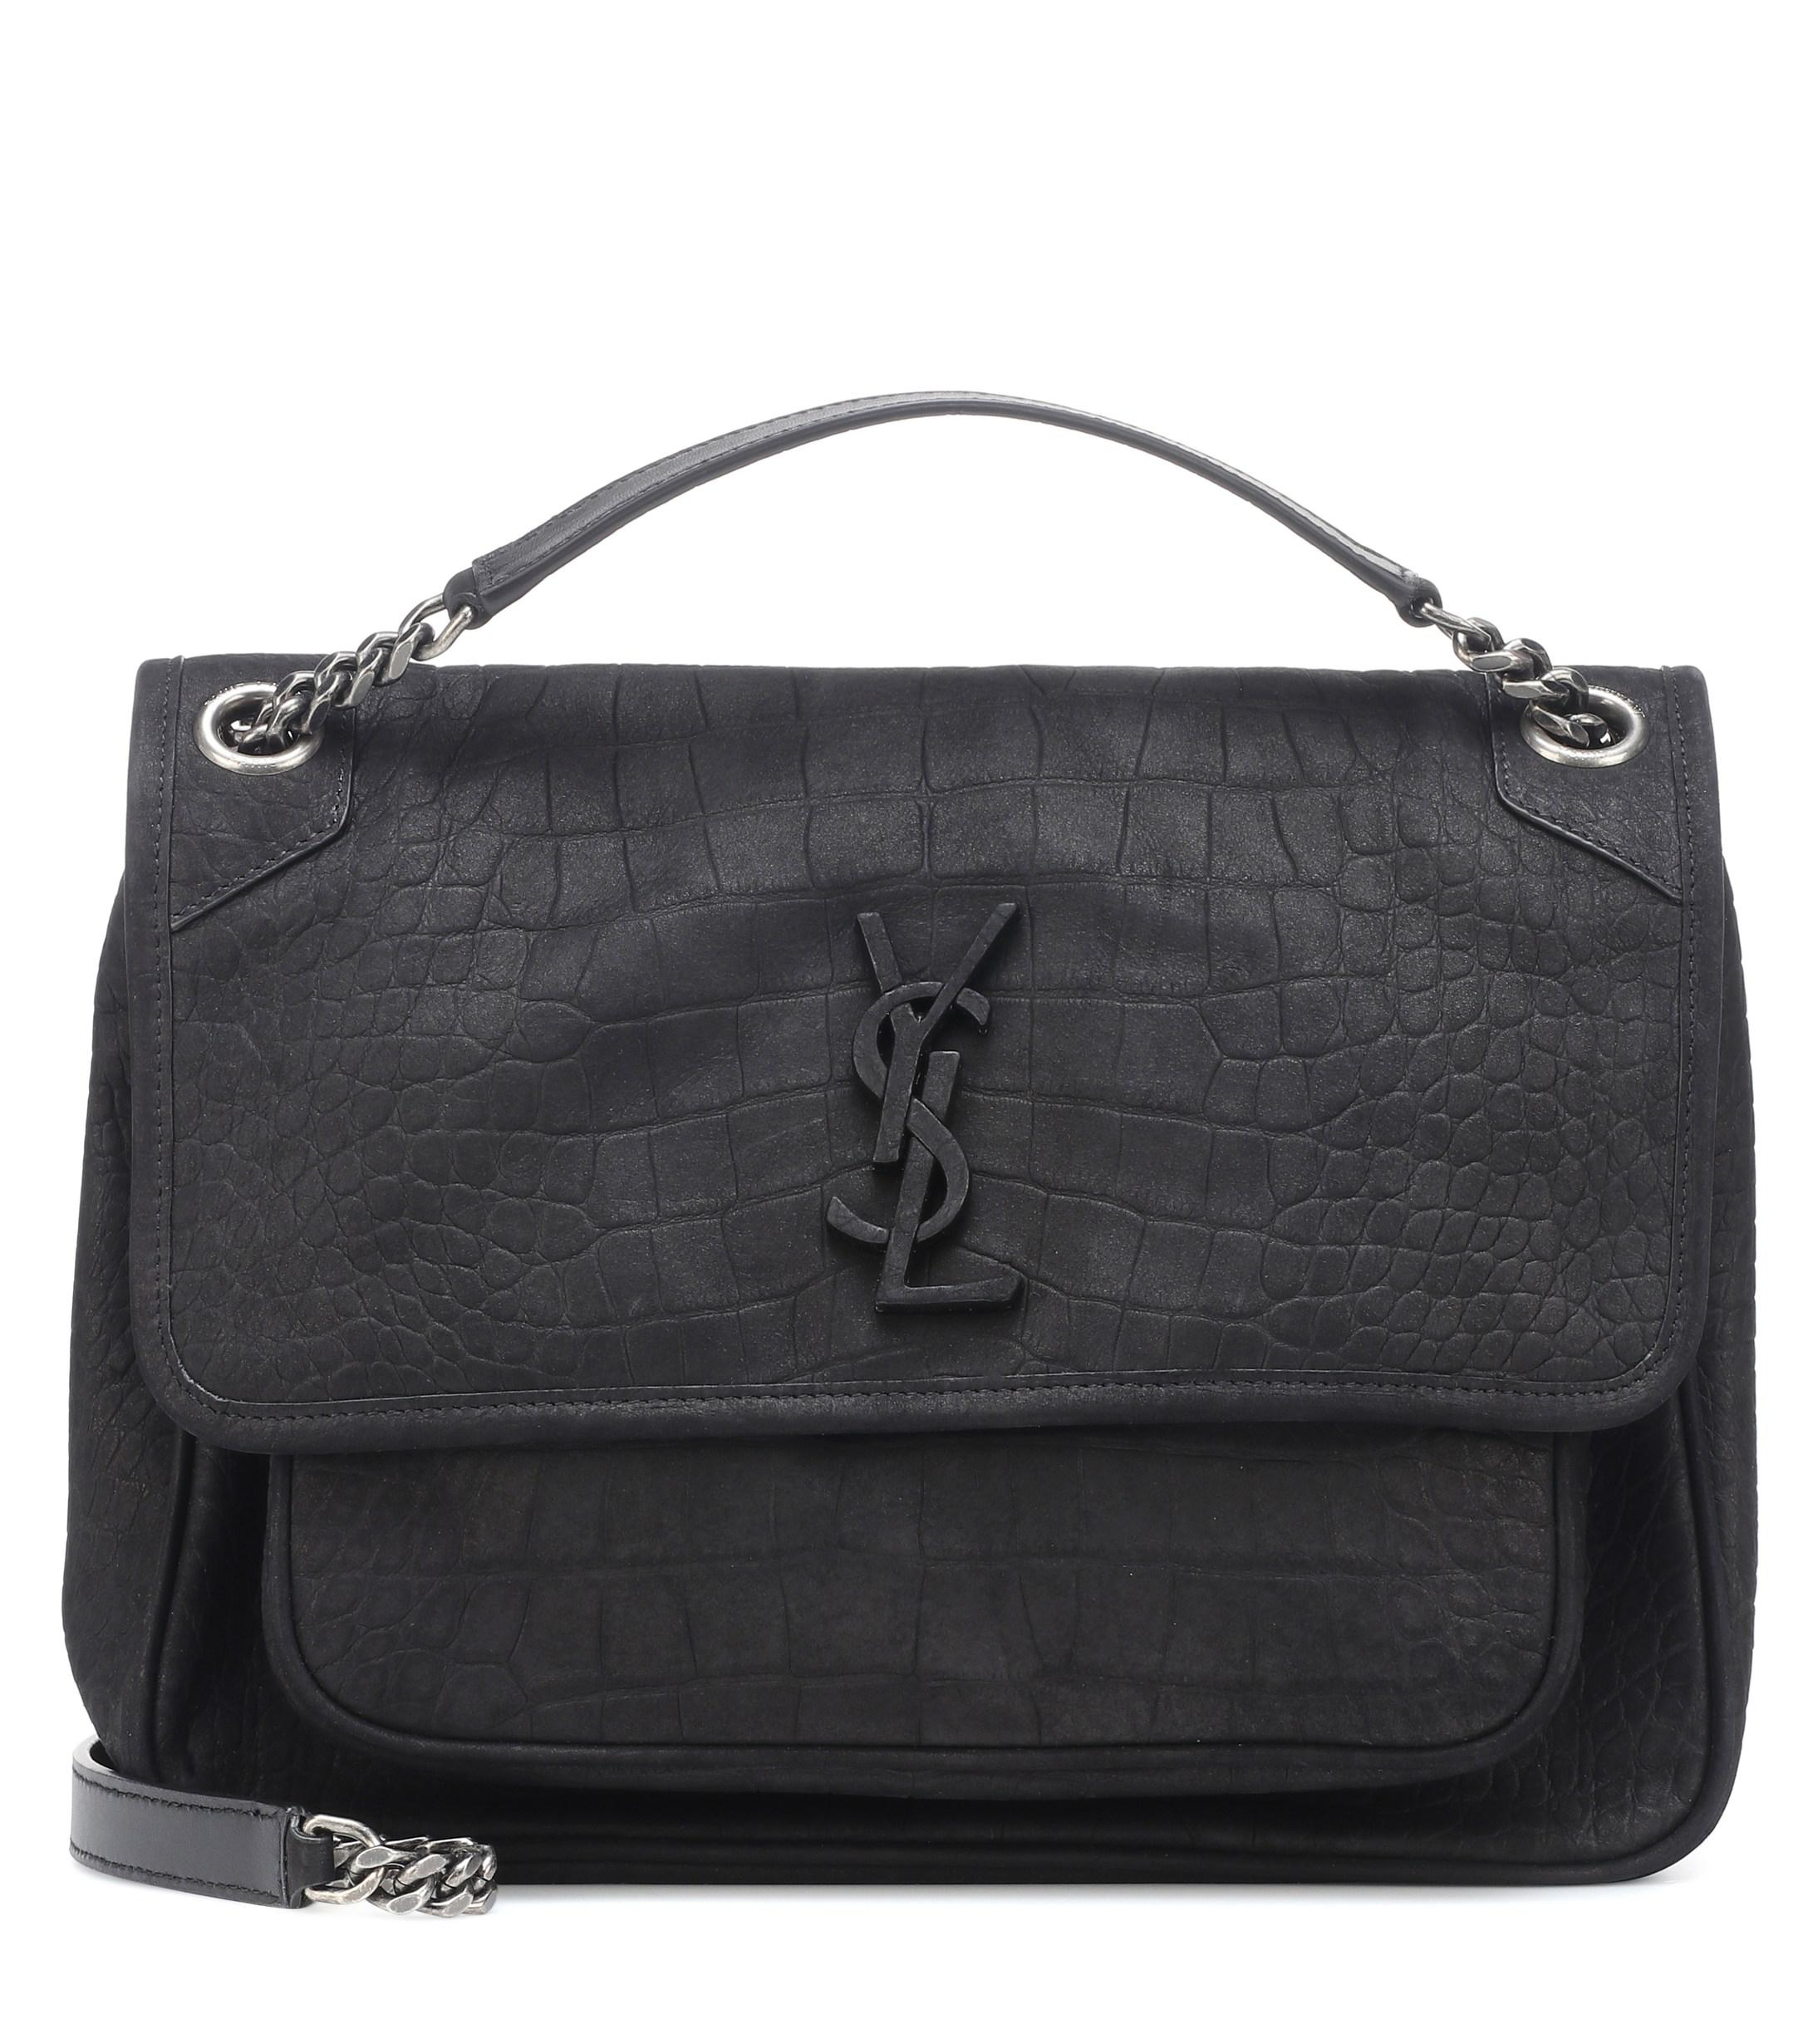 df67e9873dbc Lyst - Saint Laurent Medium Niki Suede Shoulder Bag in Black